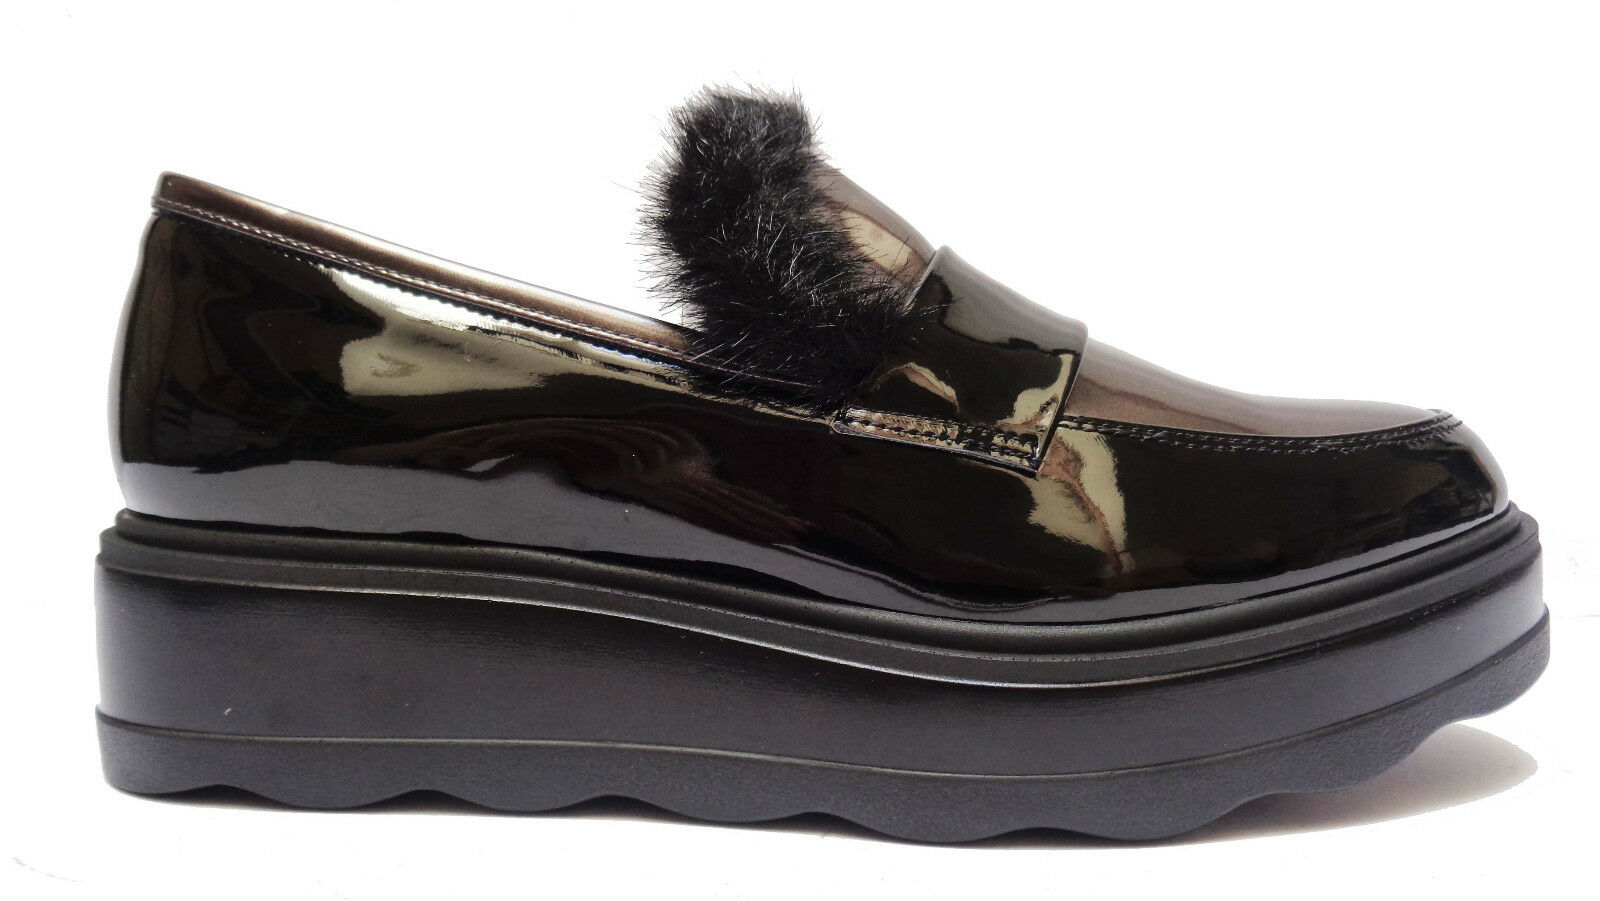 chaussures DA femmes CINZIA SOFT LINEA COMODA MOCASSINI IN VERNICE noir ZEPPA CM. 4